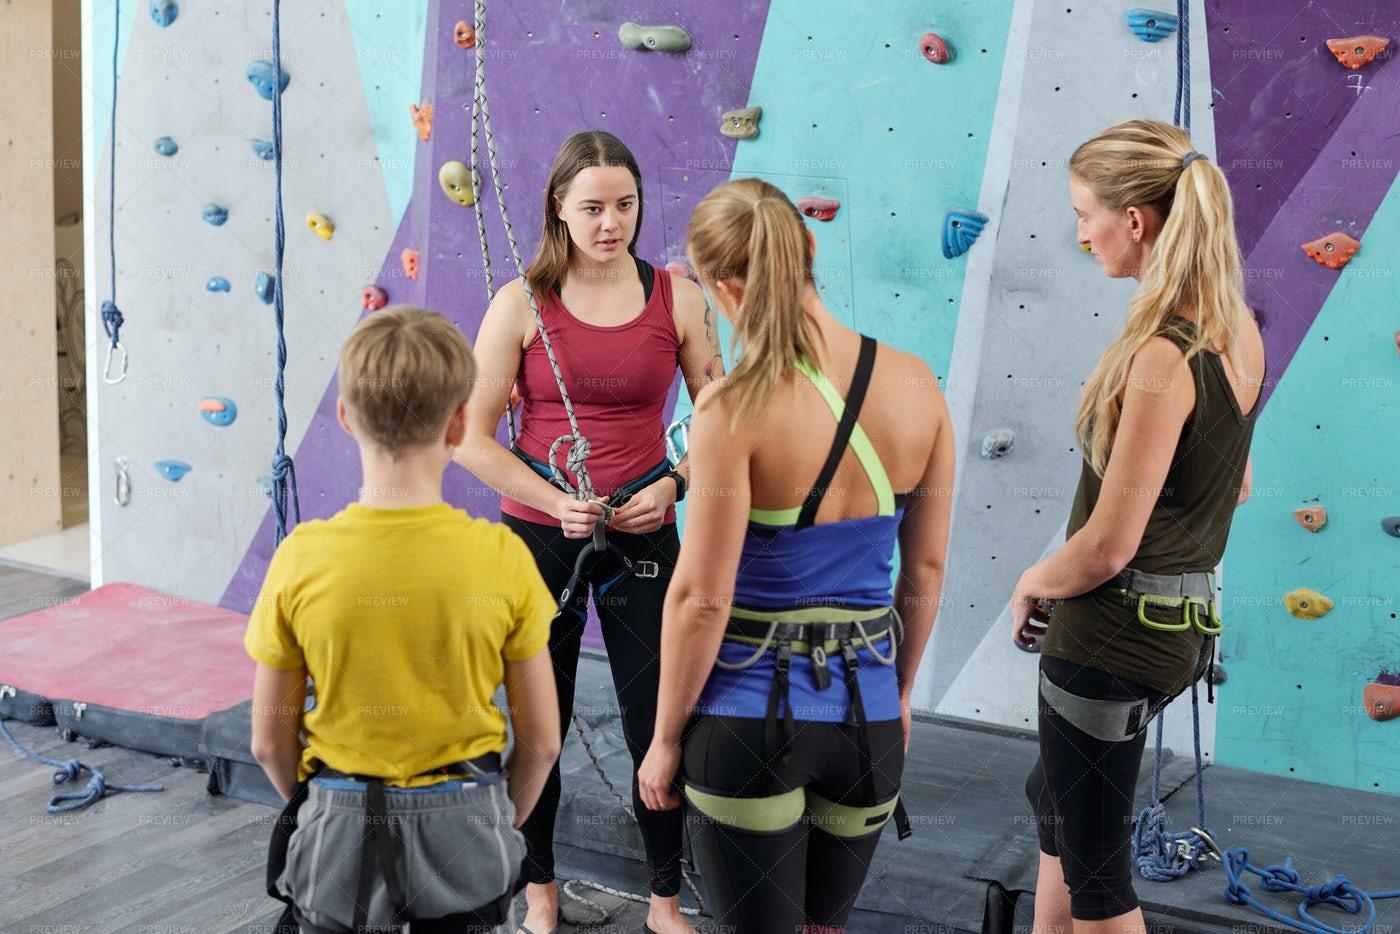 Young Climbing Instructor...: Stock Photos